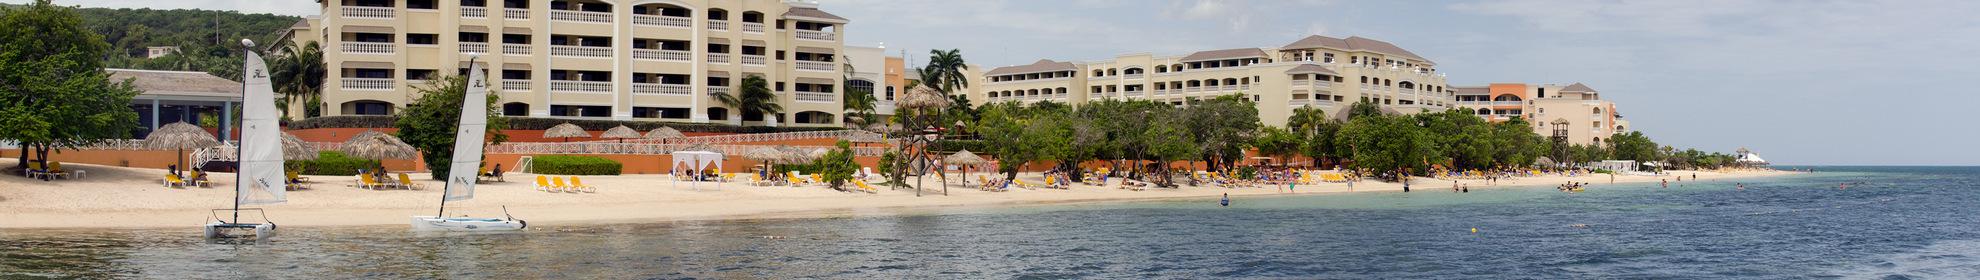 Sunset Beach Resort Spa All Inclusive Montego Bay